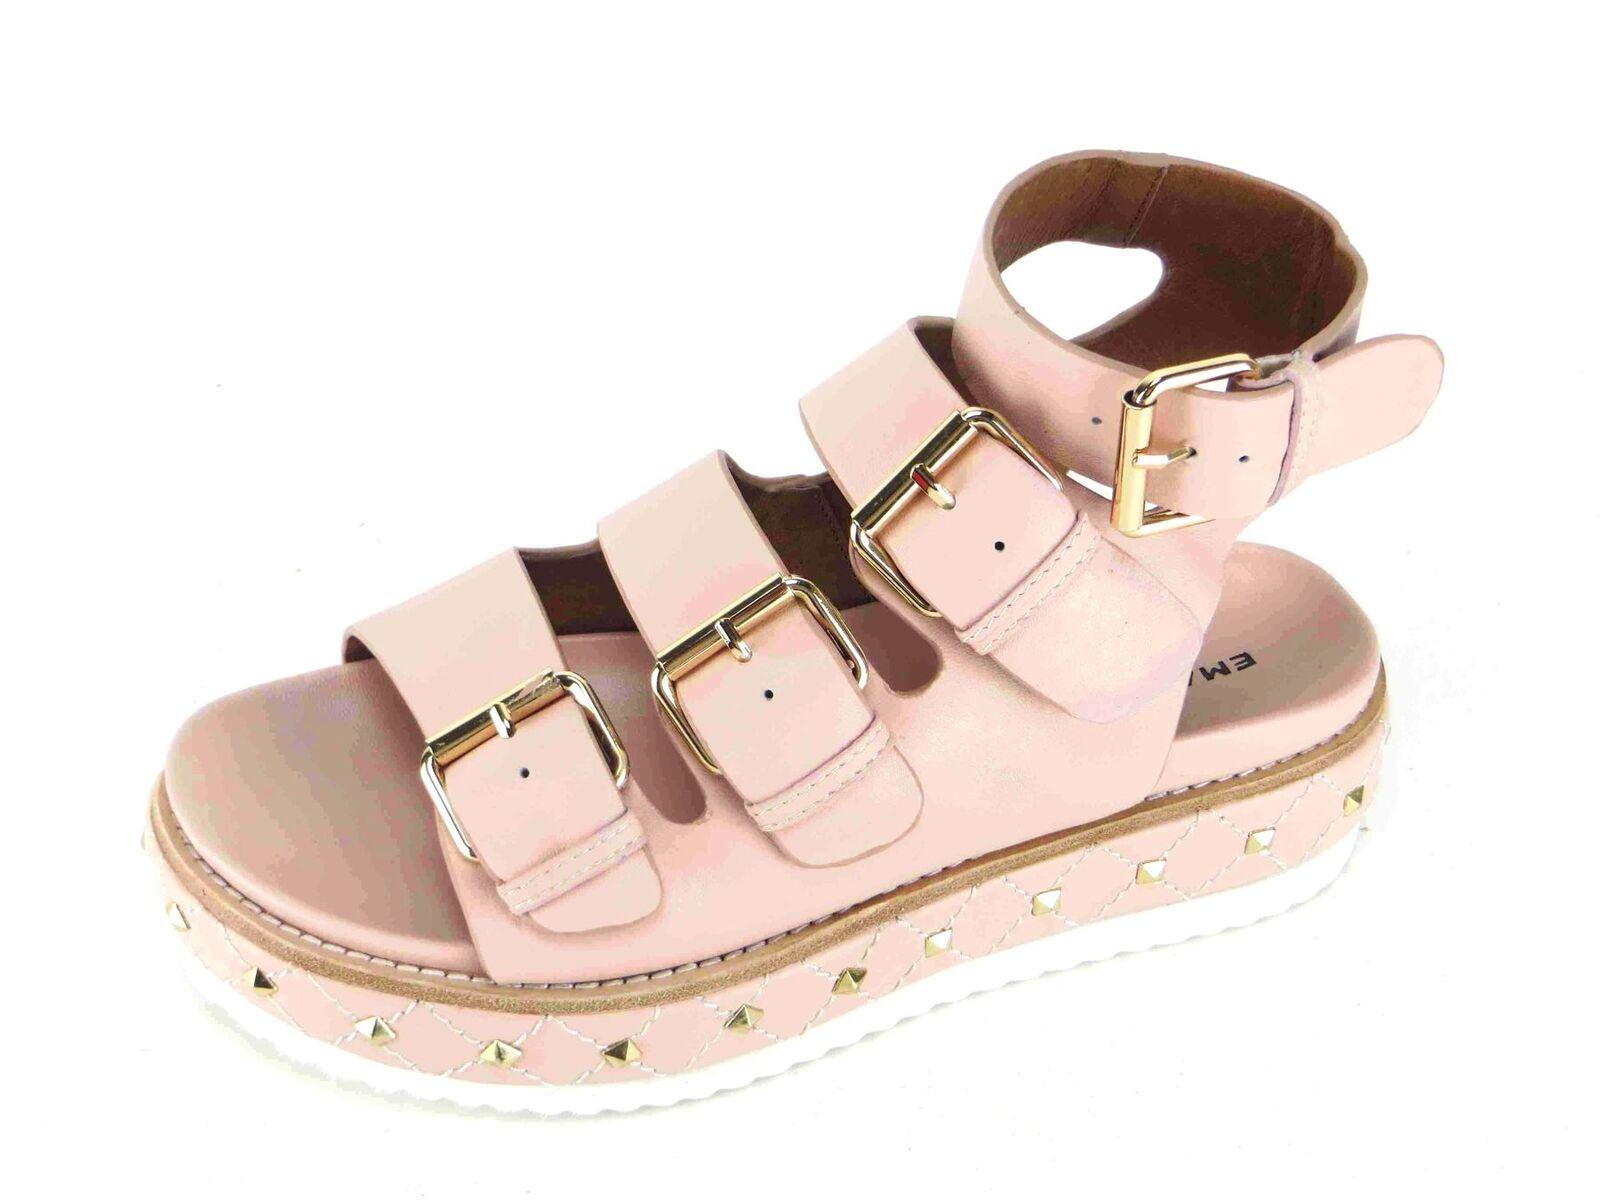 EMANUELLE pelle VEE P/E 18 sandalo con platform pelle EMANUELLE cinturini  fibbia 481-335-14-909 0e2ca0